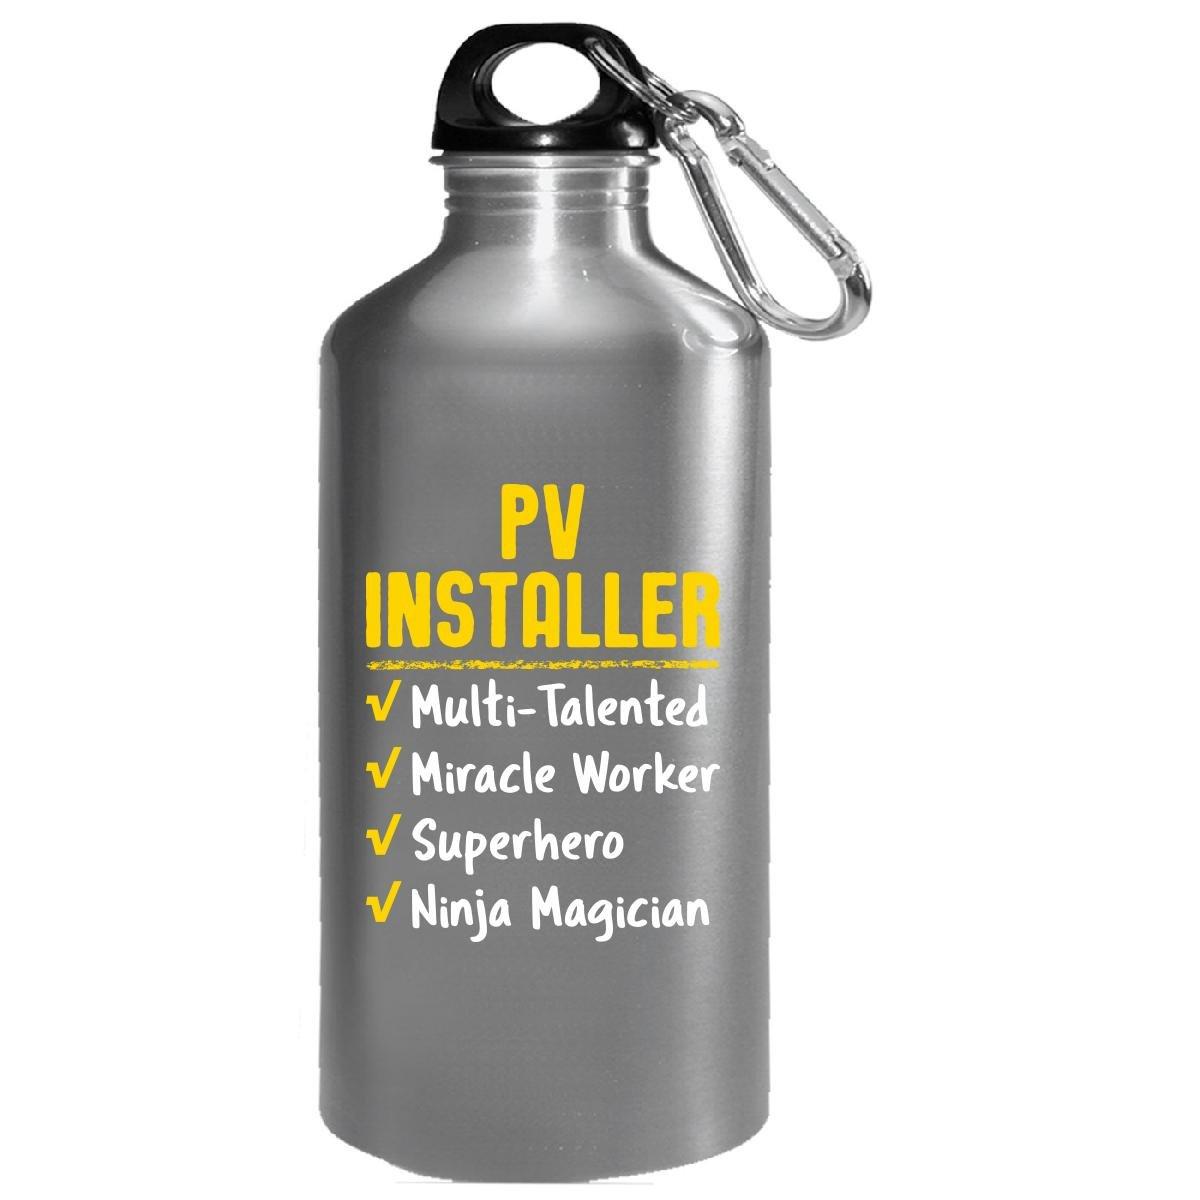 Pv Installer Miracle Worker Superhero Ninja Funny Solar Gift - Water Bottle